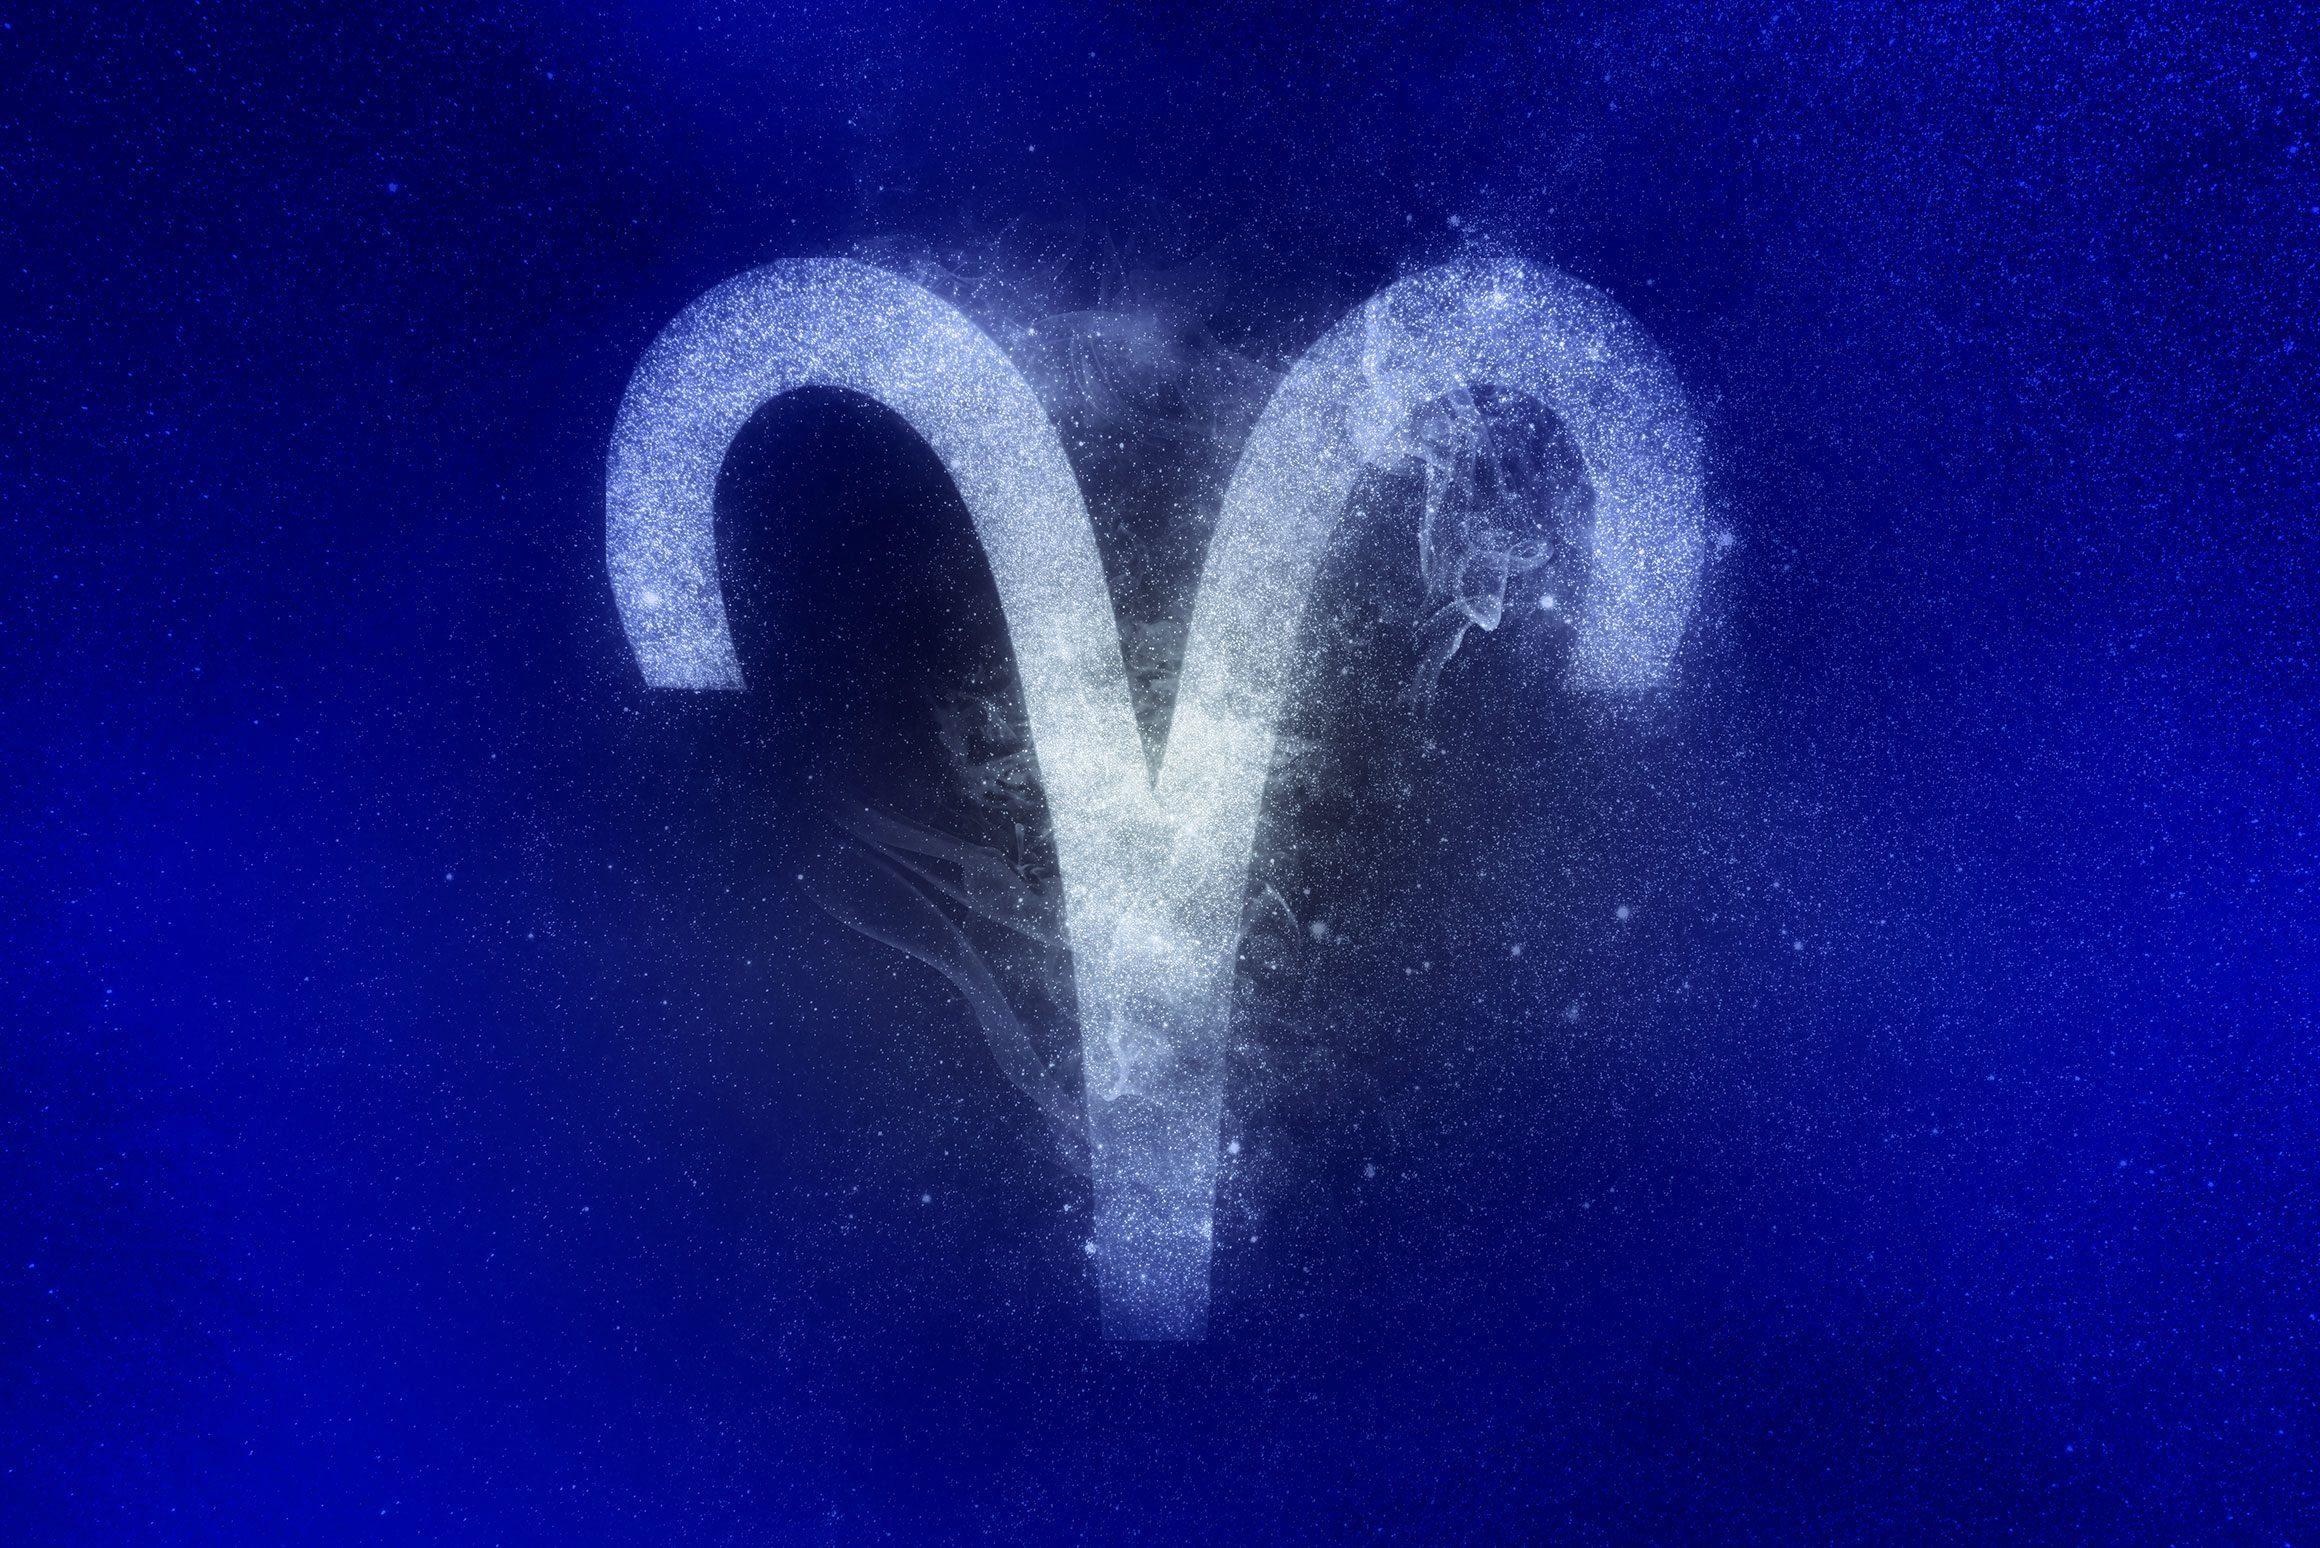 aries zodiac symbol in winter colors